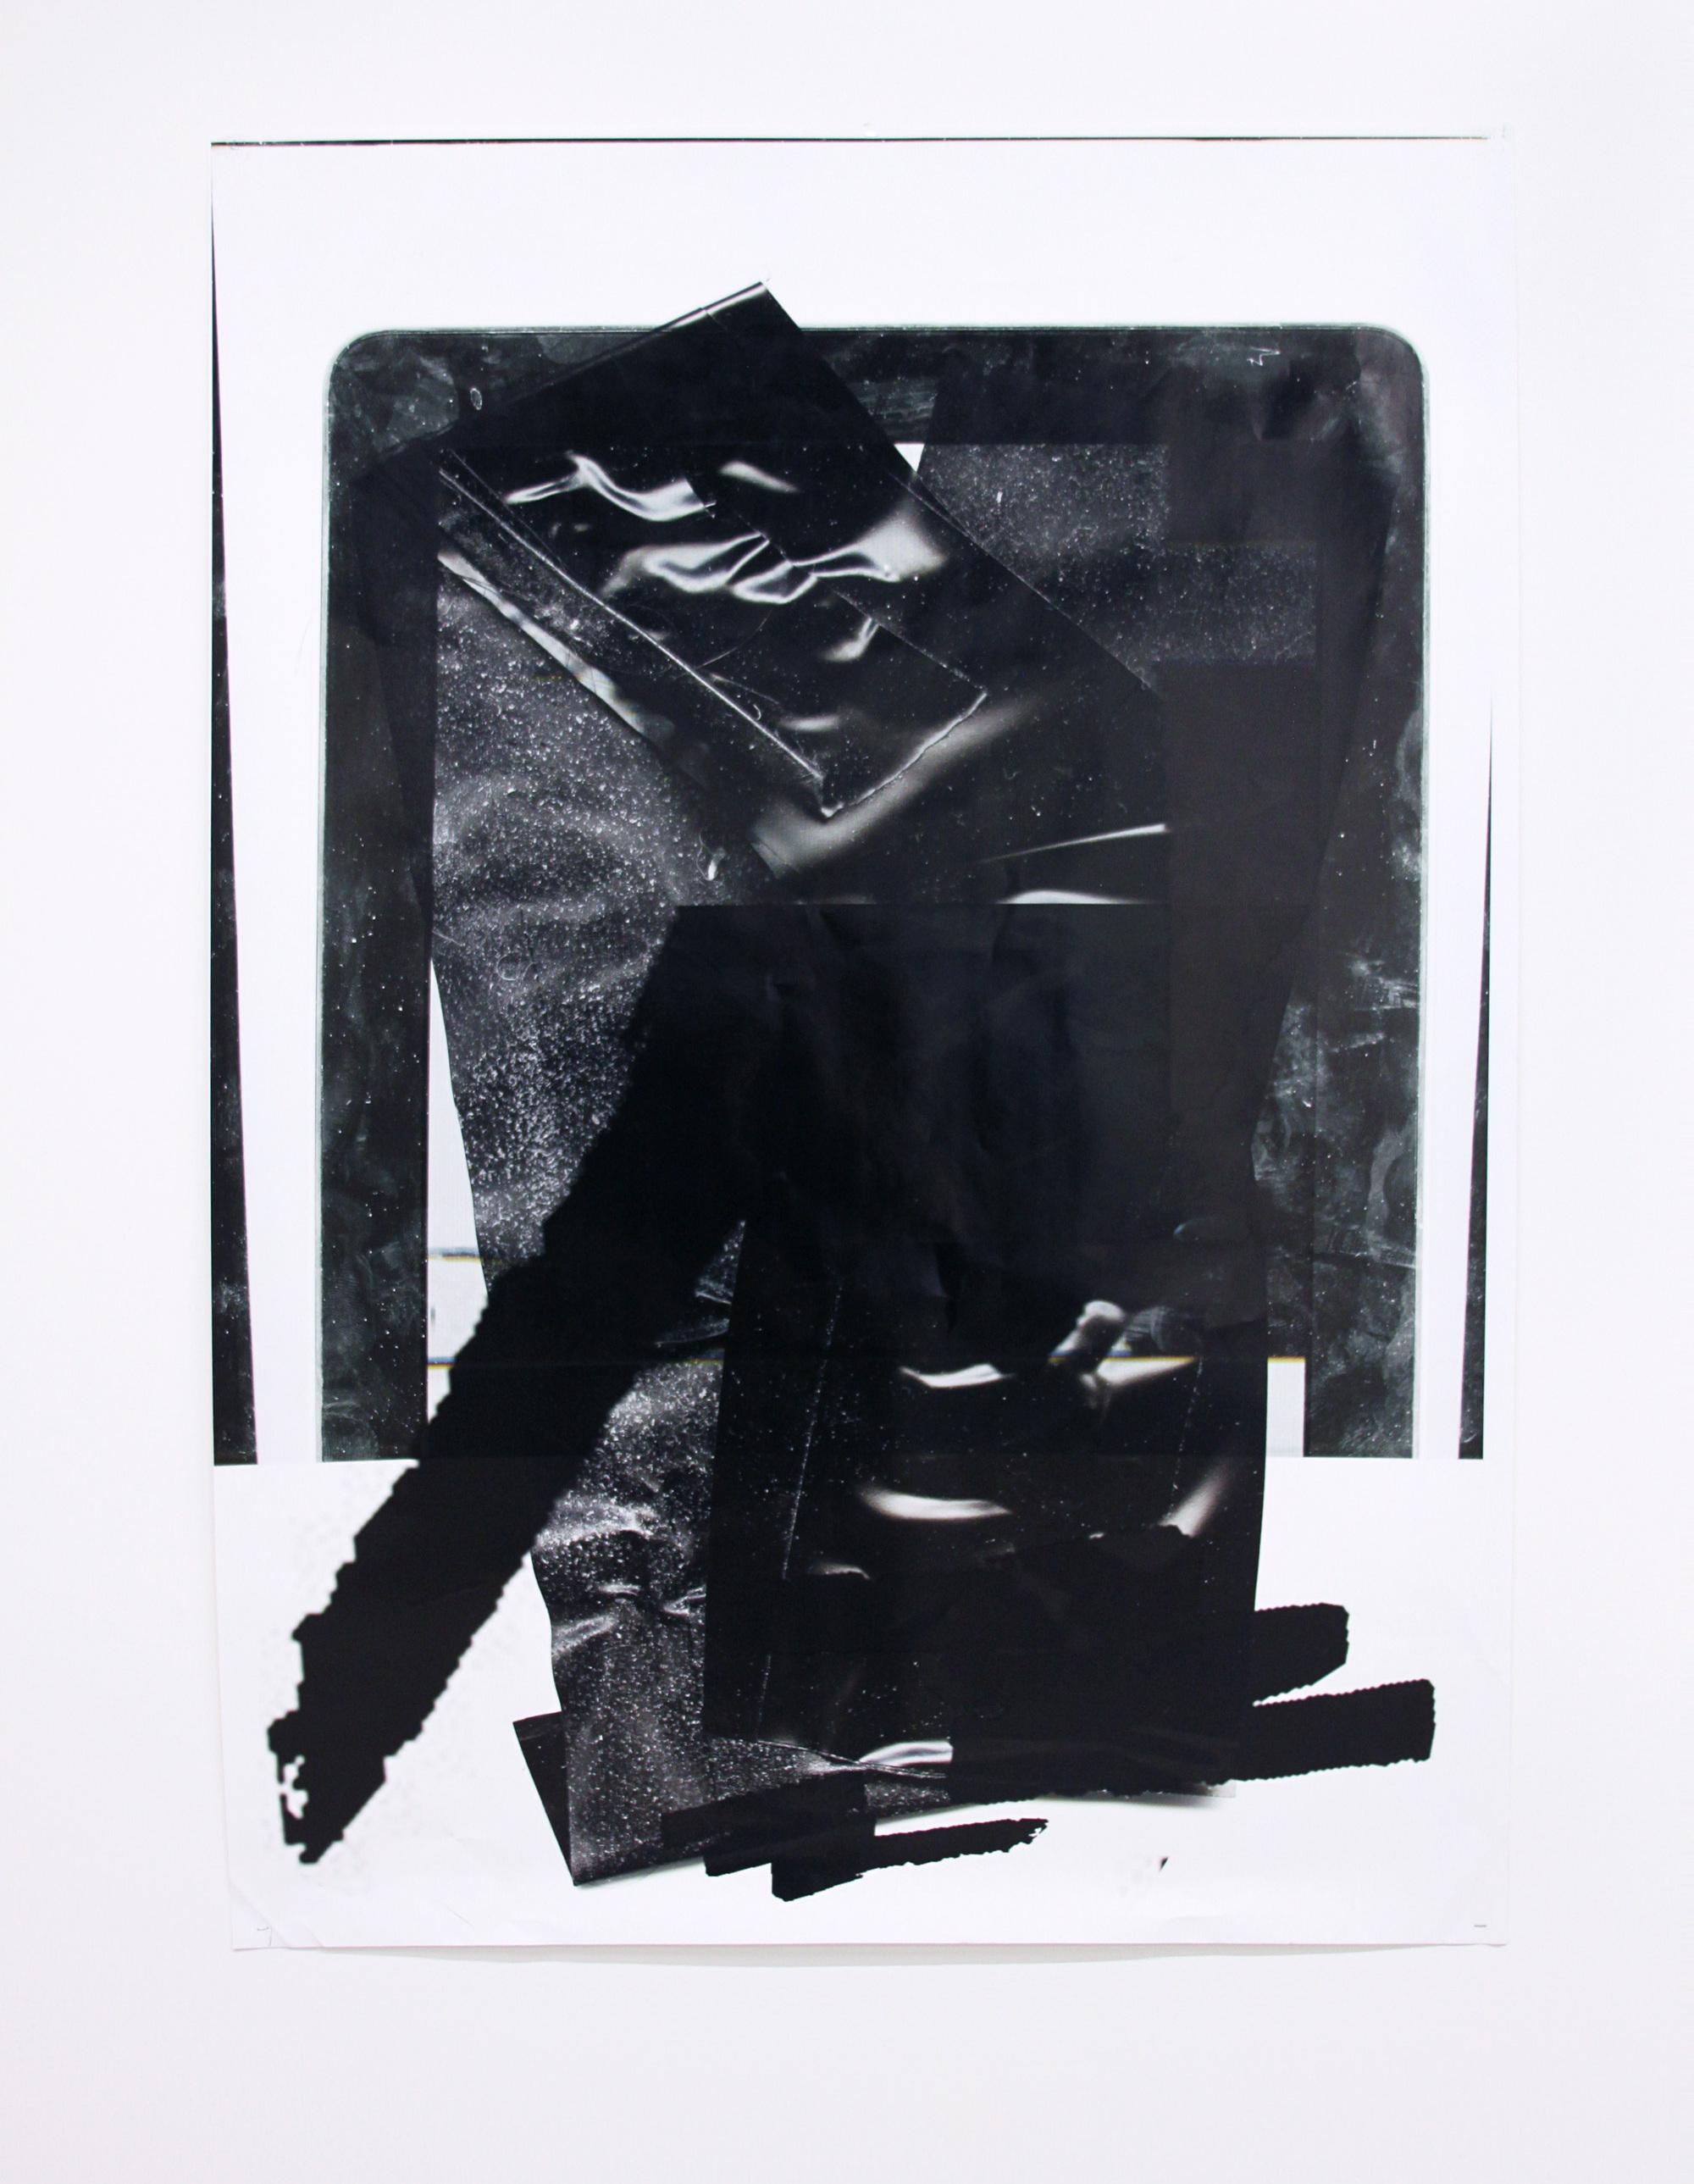 ANDREA LONGACRE-WHITE   Tech body paint fetish , 2014, Archival inkjet print, used restrain tape, iPad, epson logo paint gesture, staples